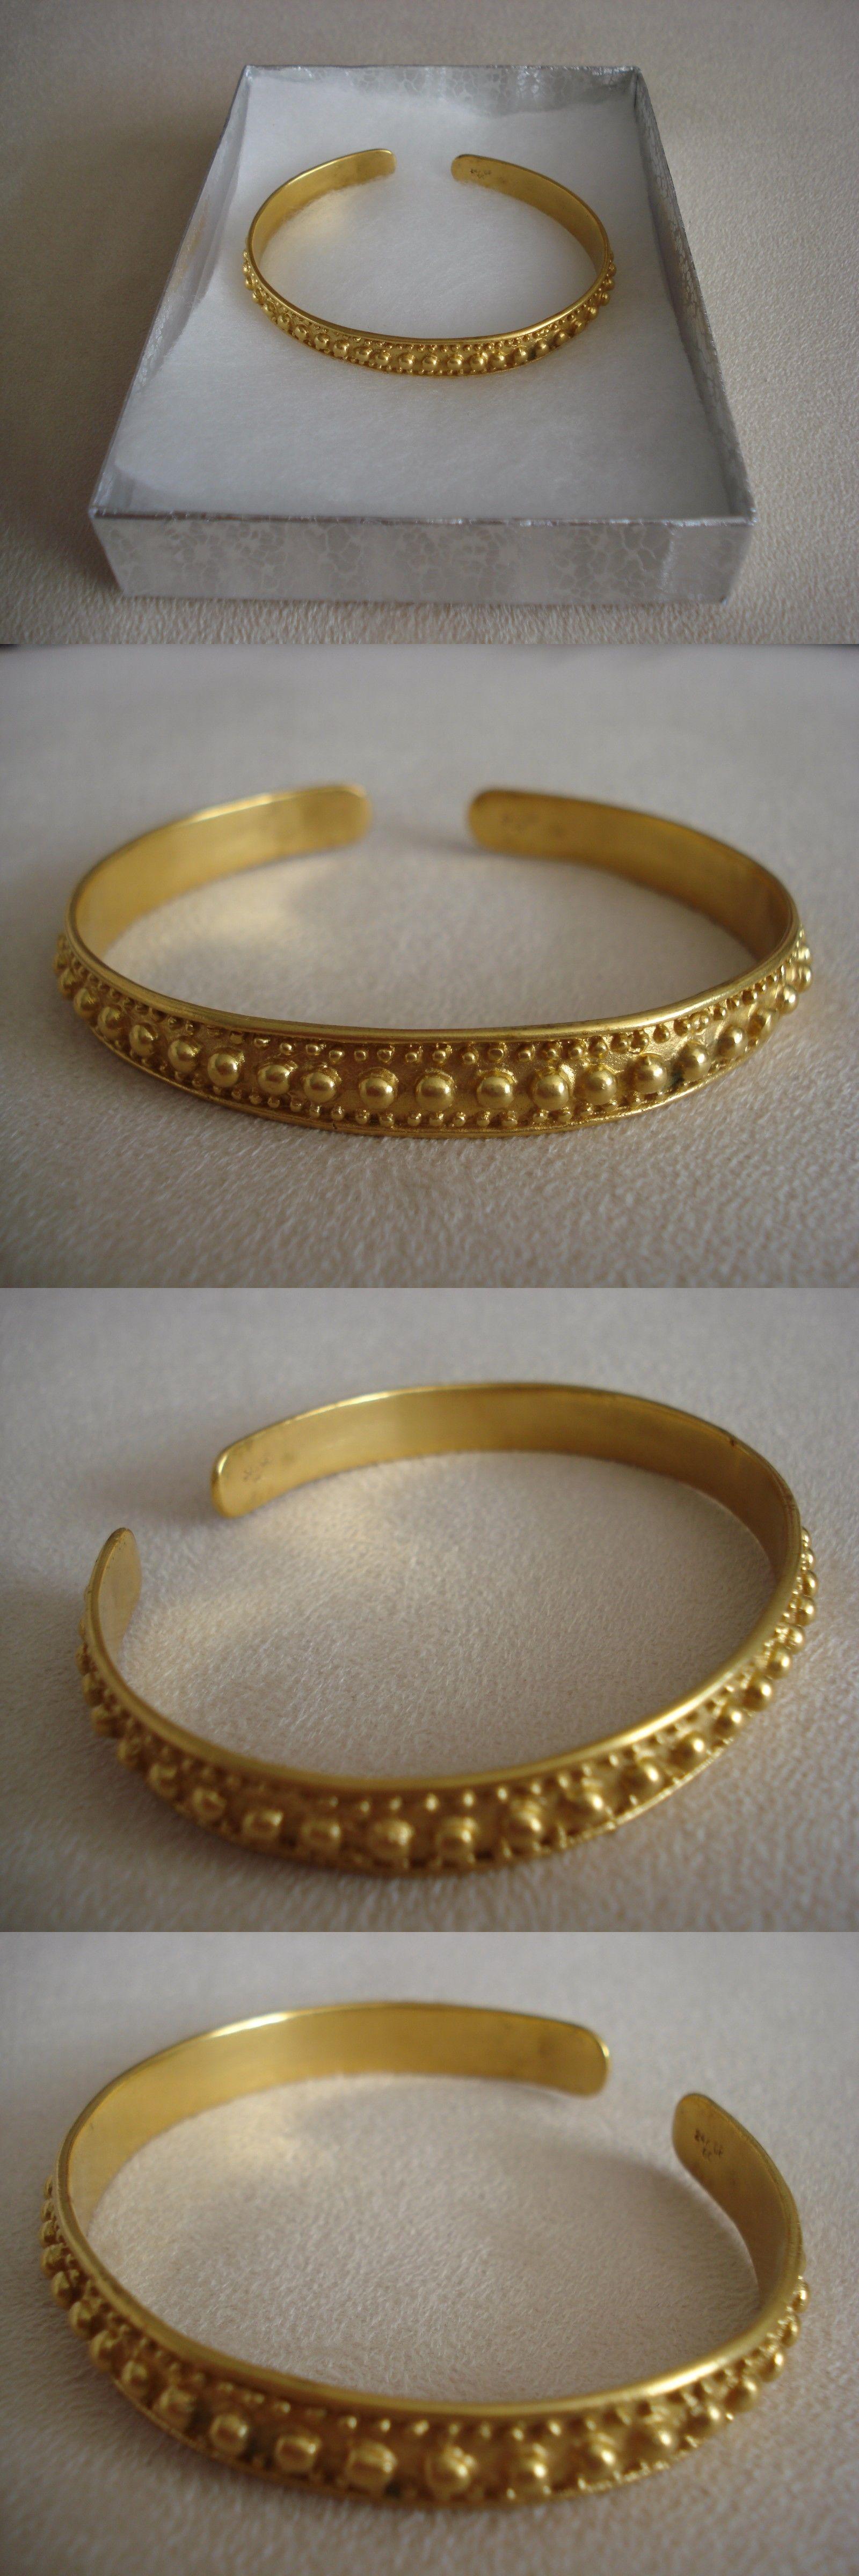 Bracelets 98504 Precolumbian Replica Bracelet 24K Gold Plated